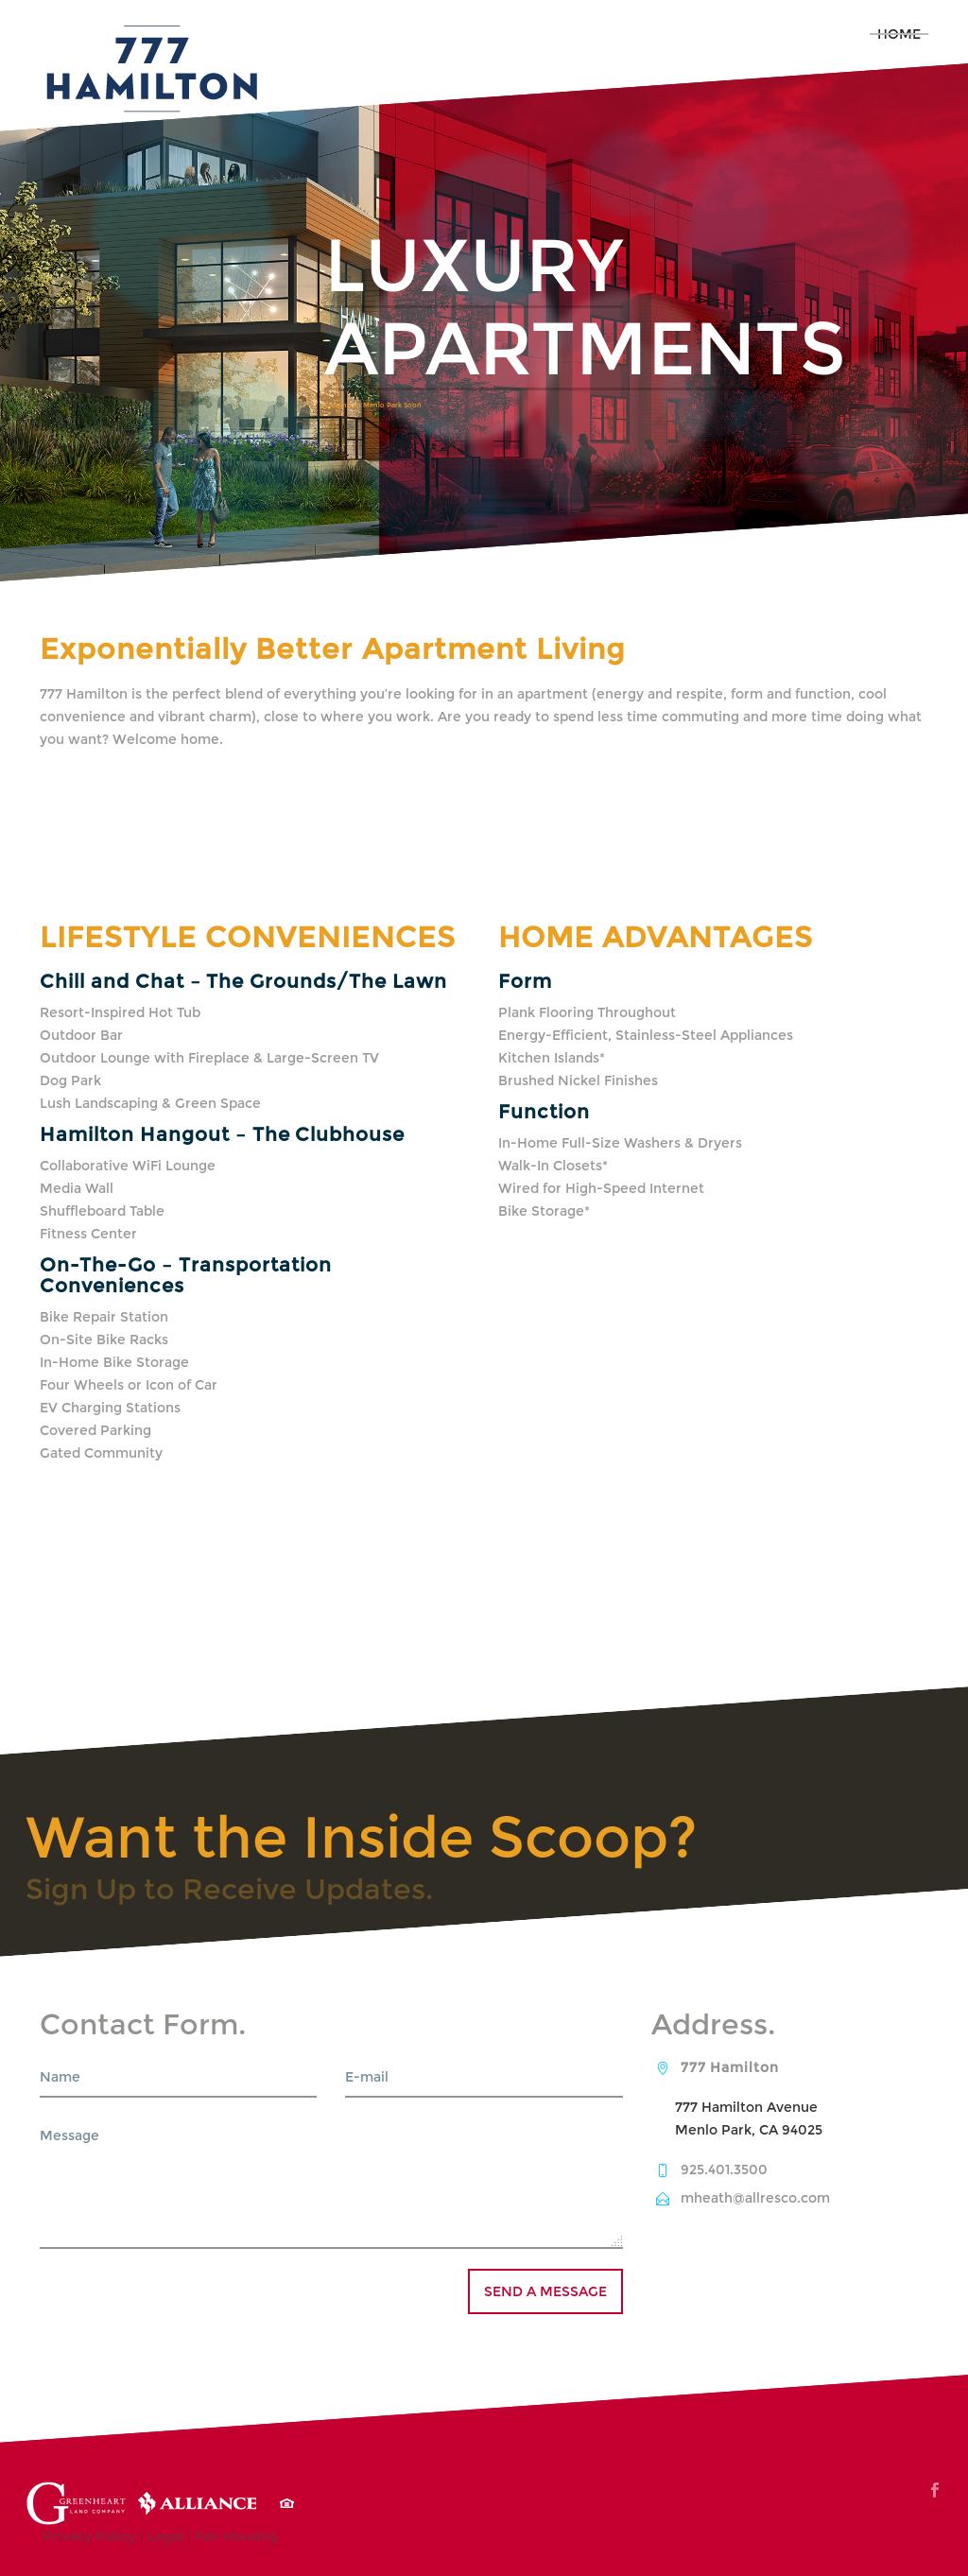 Allresco 777 hamilton apartment homes competitors, revenue and